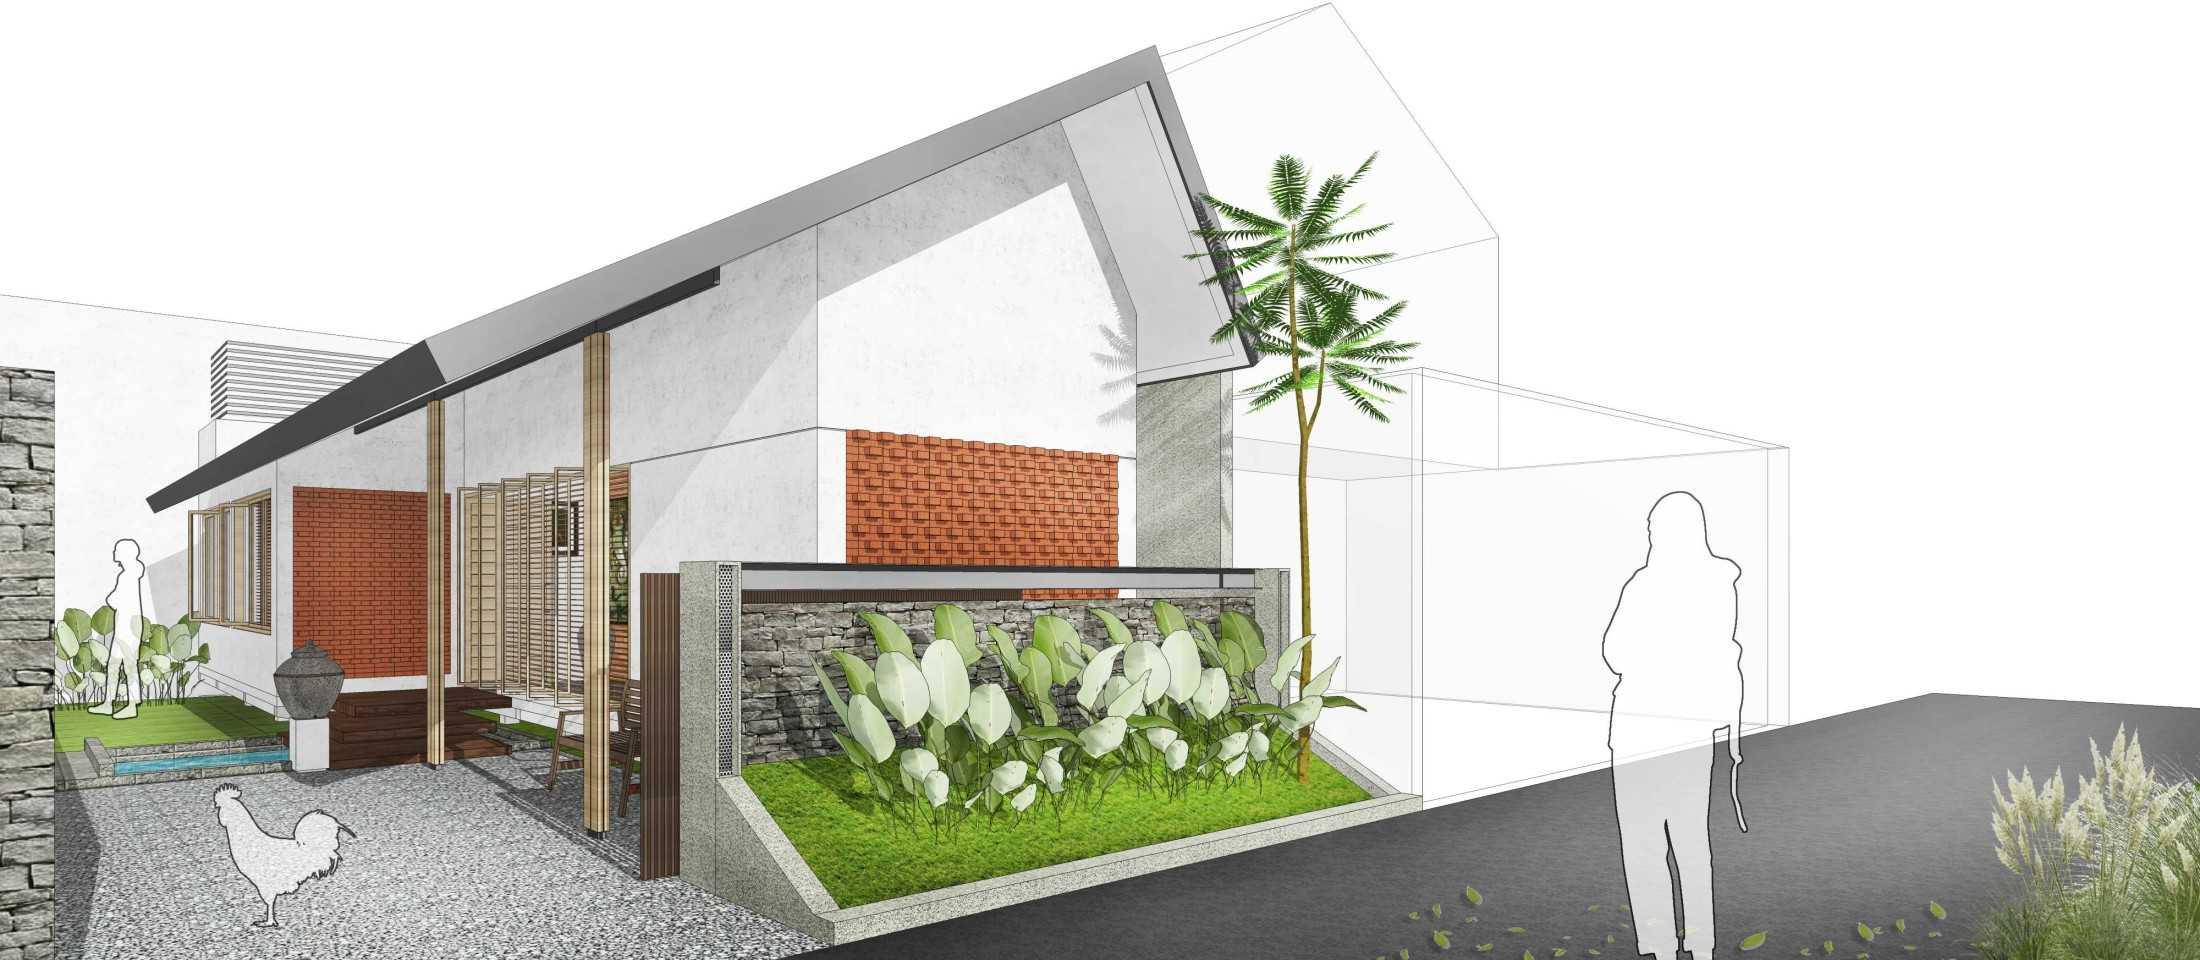 Dz Design Works Rumah Rehat Kabupaten Sleman, Daerah Istimewa Yogyakarta, Indonesia Kabupaten Sleman, Daerah Istimewa Yogyakarta, Indonesia Dz-Design-Works-Rumah-Rehat  131368